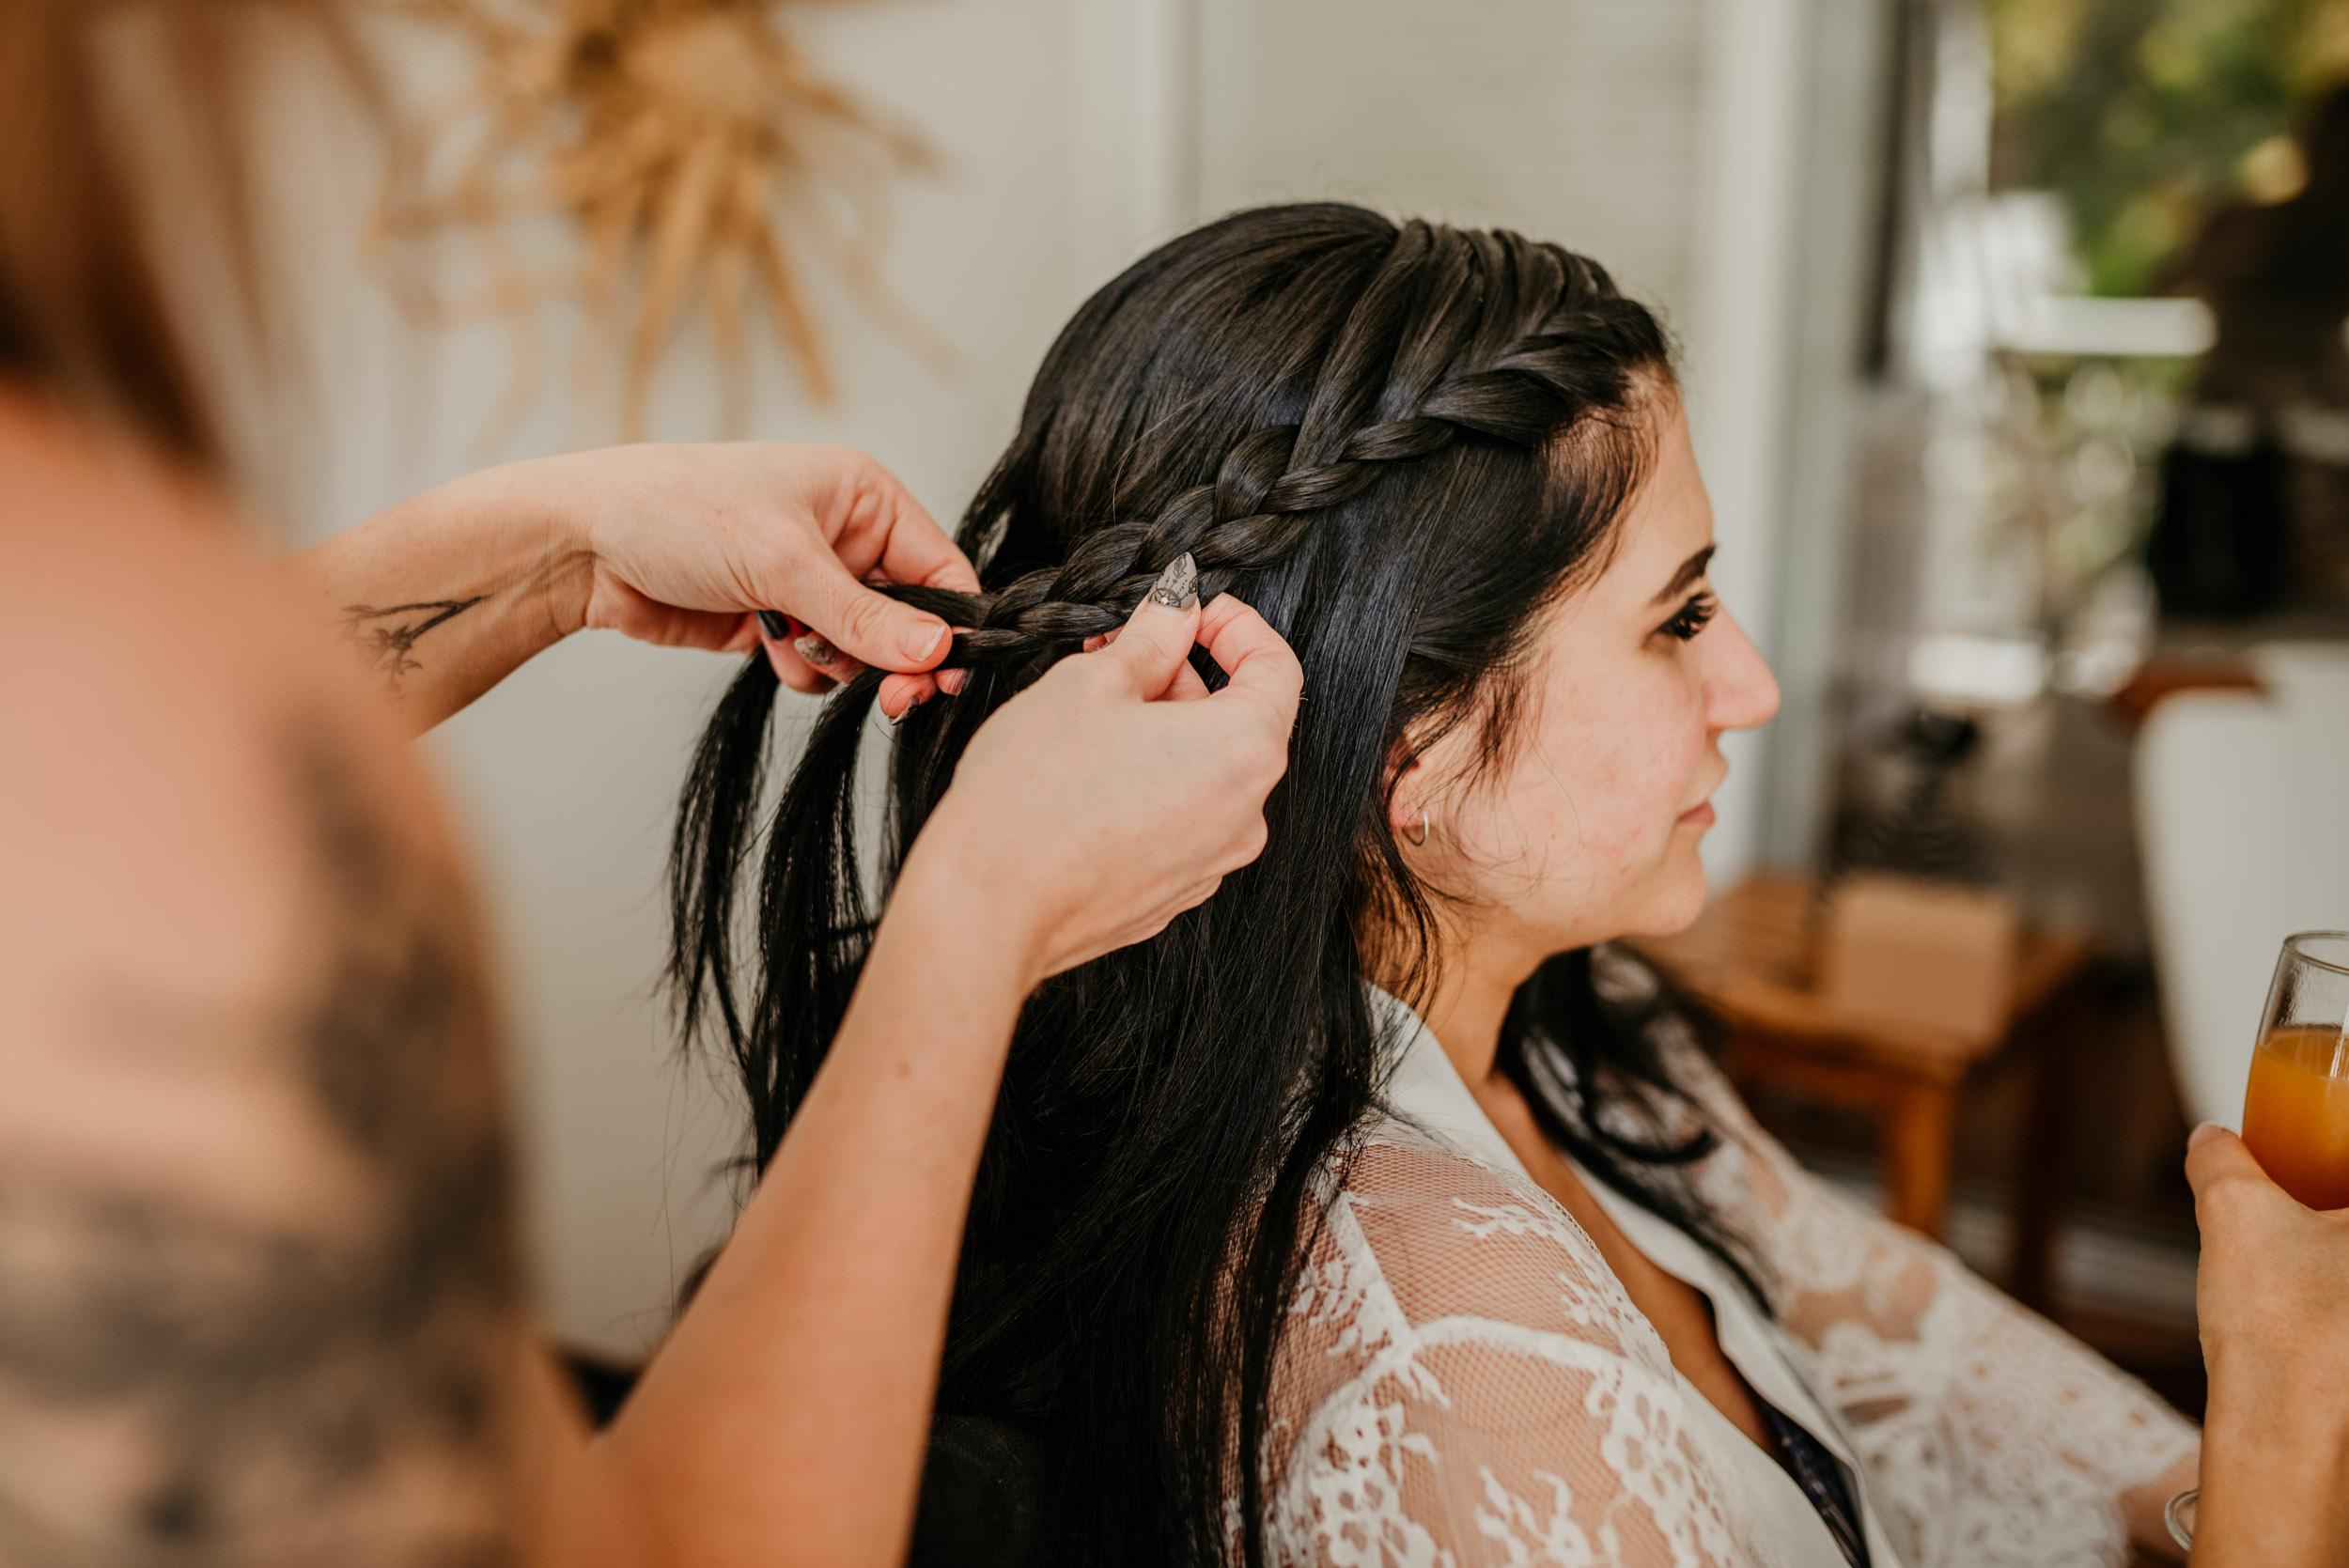 The Raw Photographer - Cairns Wedding Photographer - Beach Palm Cove Ceremony - Dress Irene Costa's Devine Bridal - Queensland-11.jpg